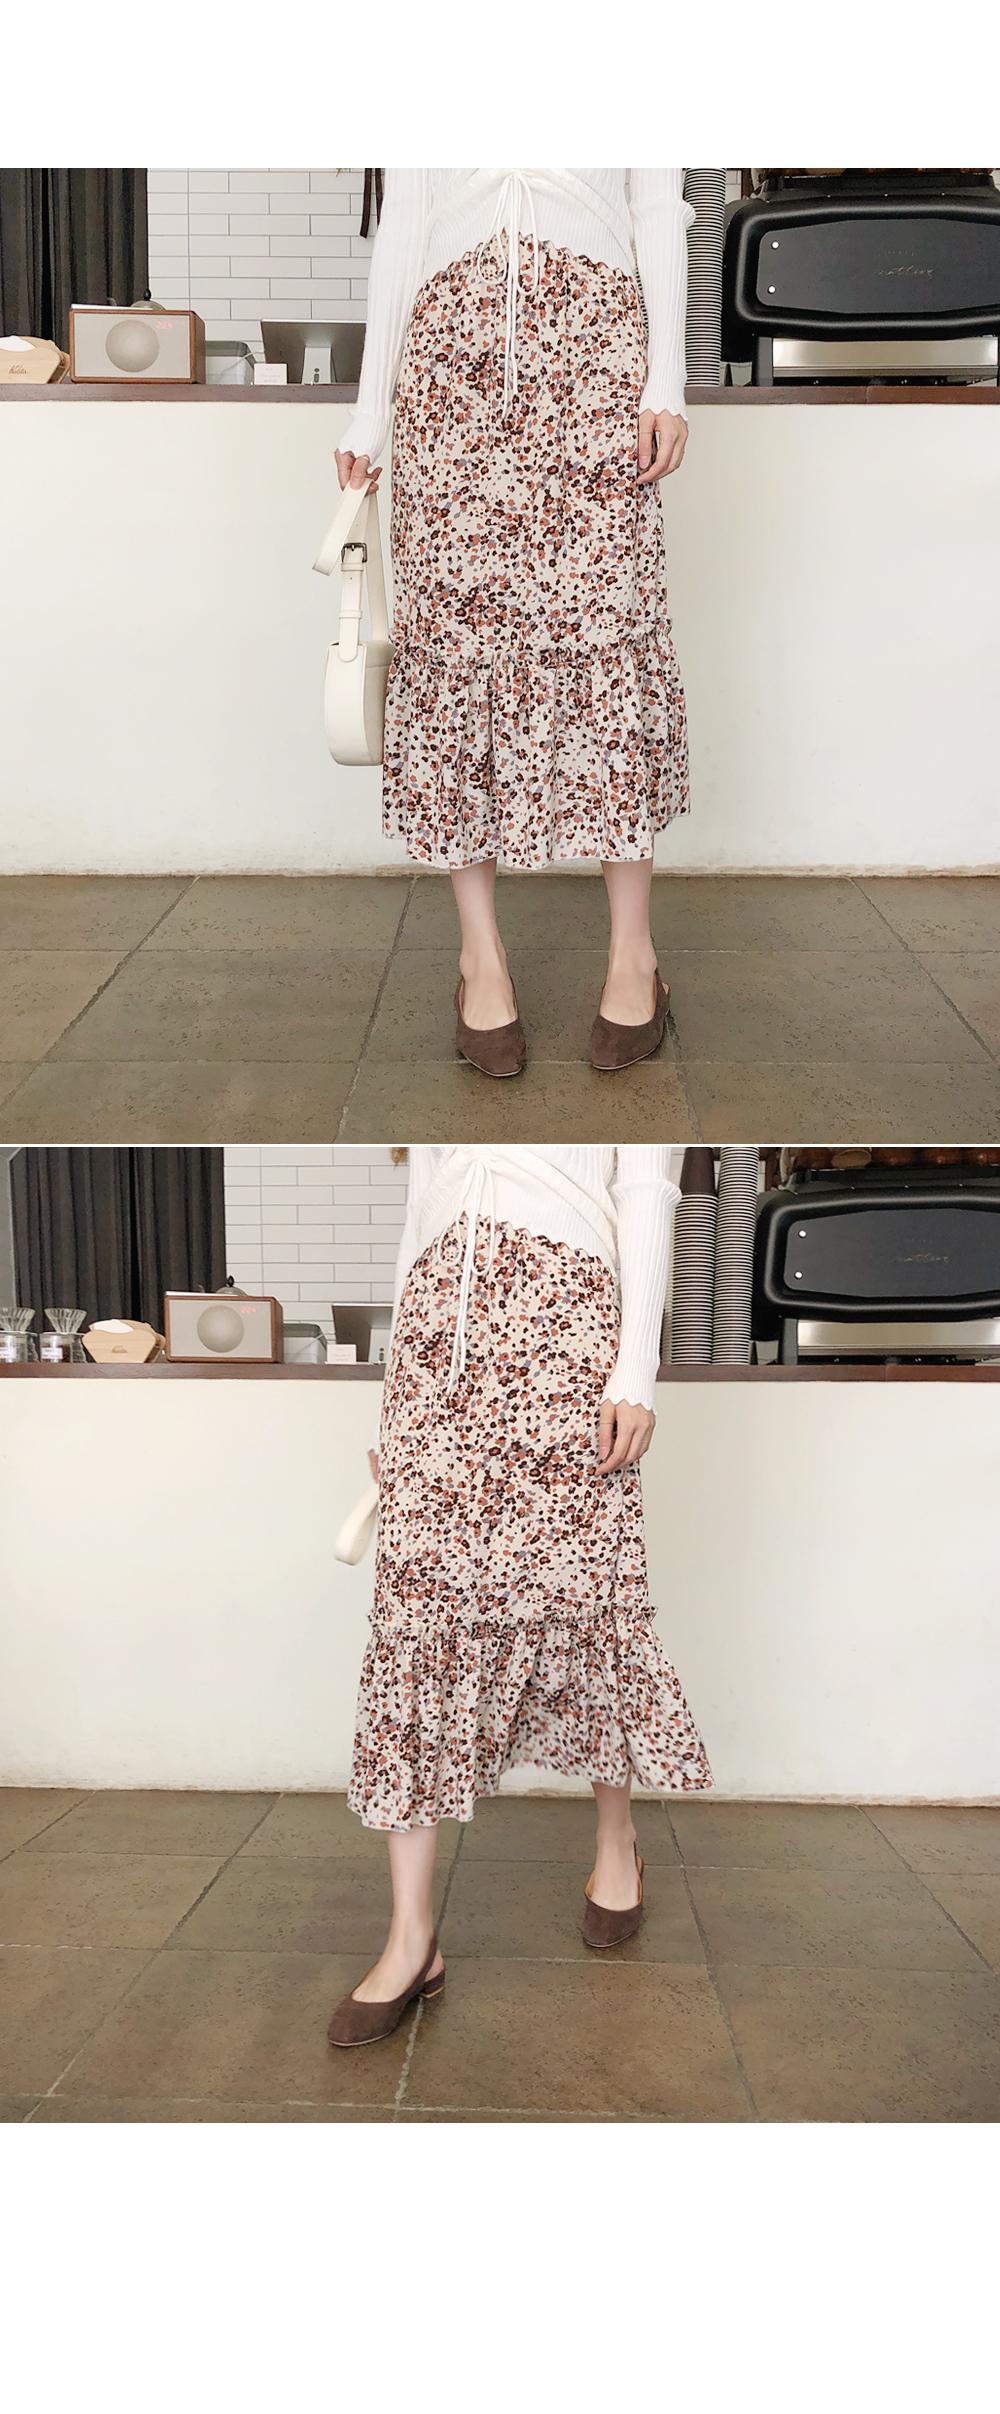 Hem shearing skirt